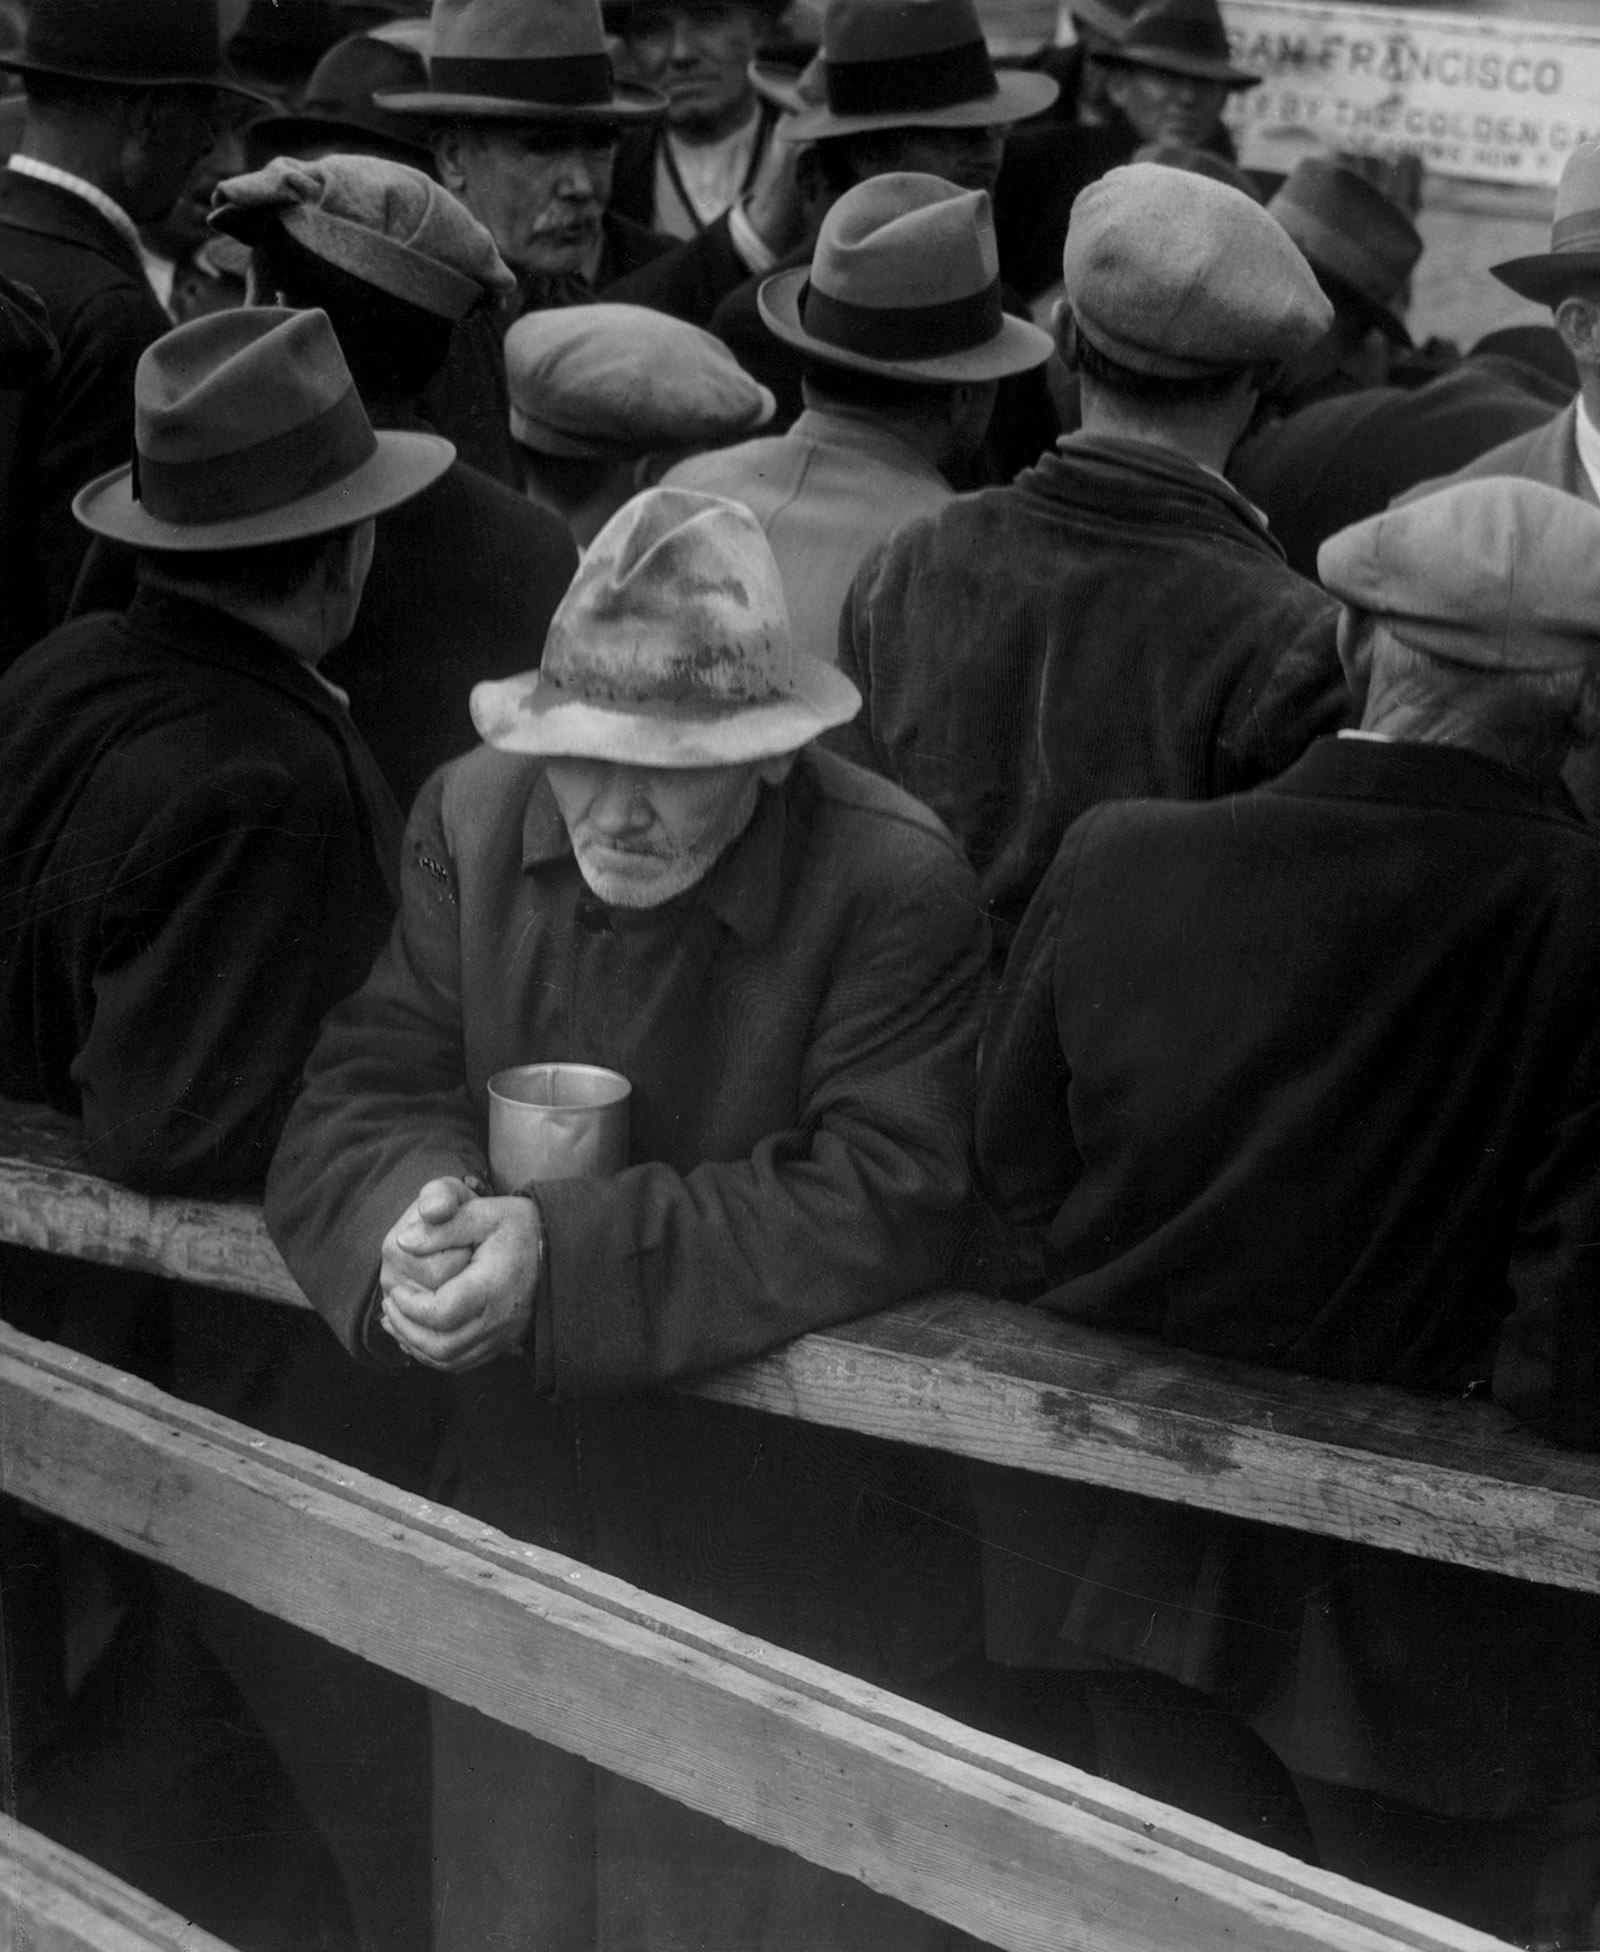 White Angel Bread Line, San Francisco, 1933; photograph by Dorothea Lange